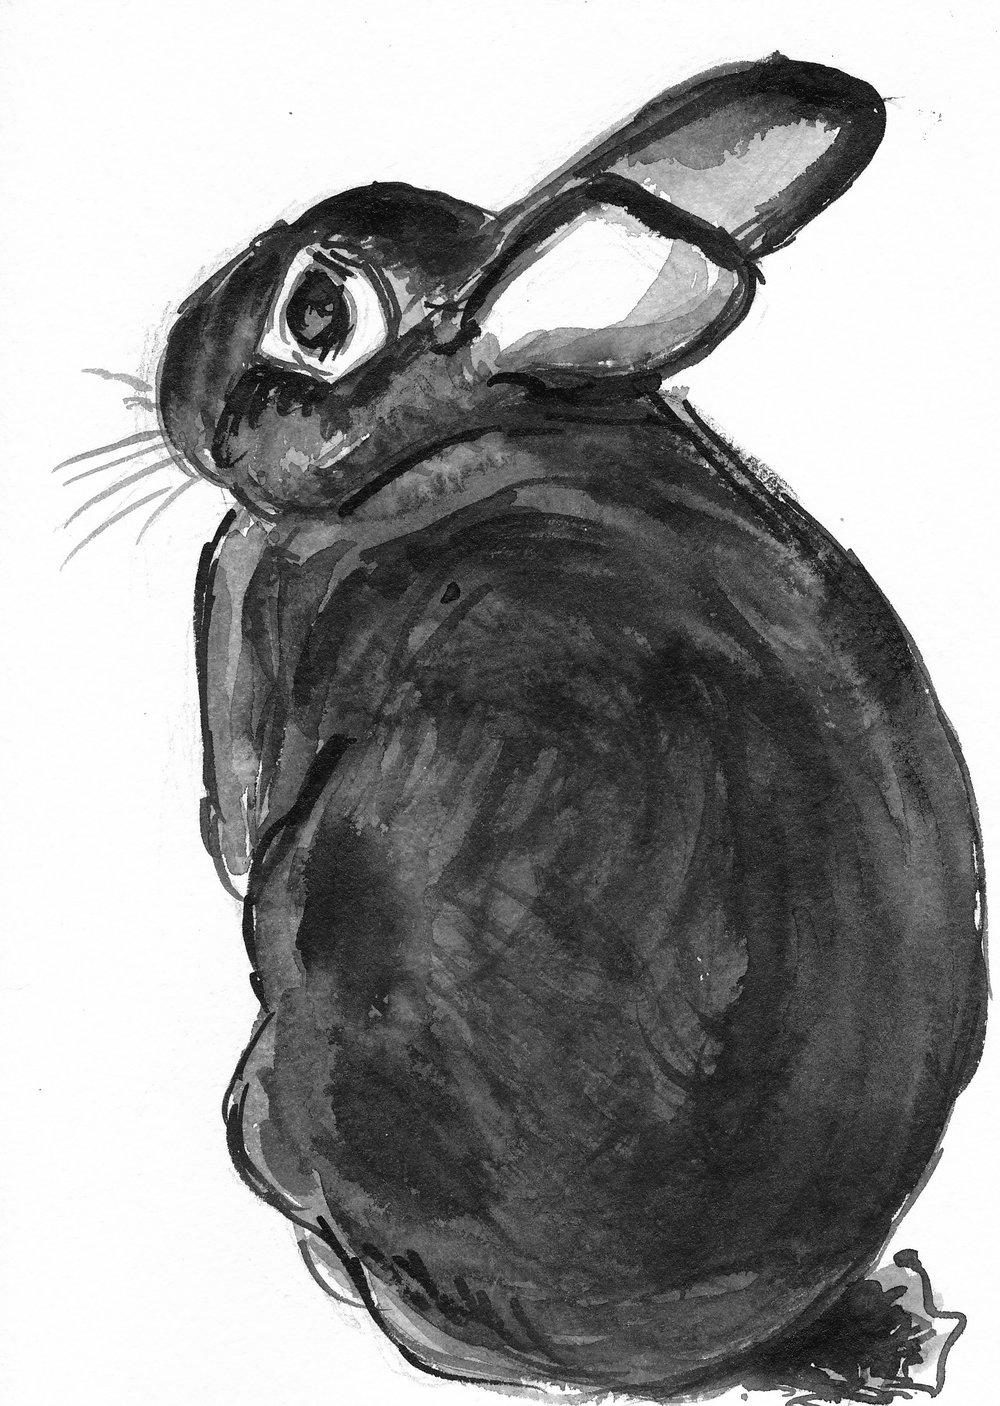 bw-bunny-sitting2.jpg